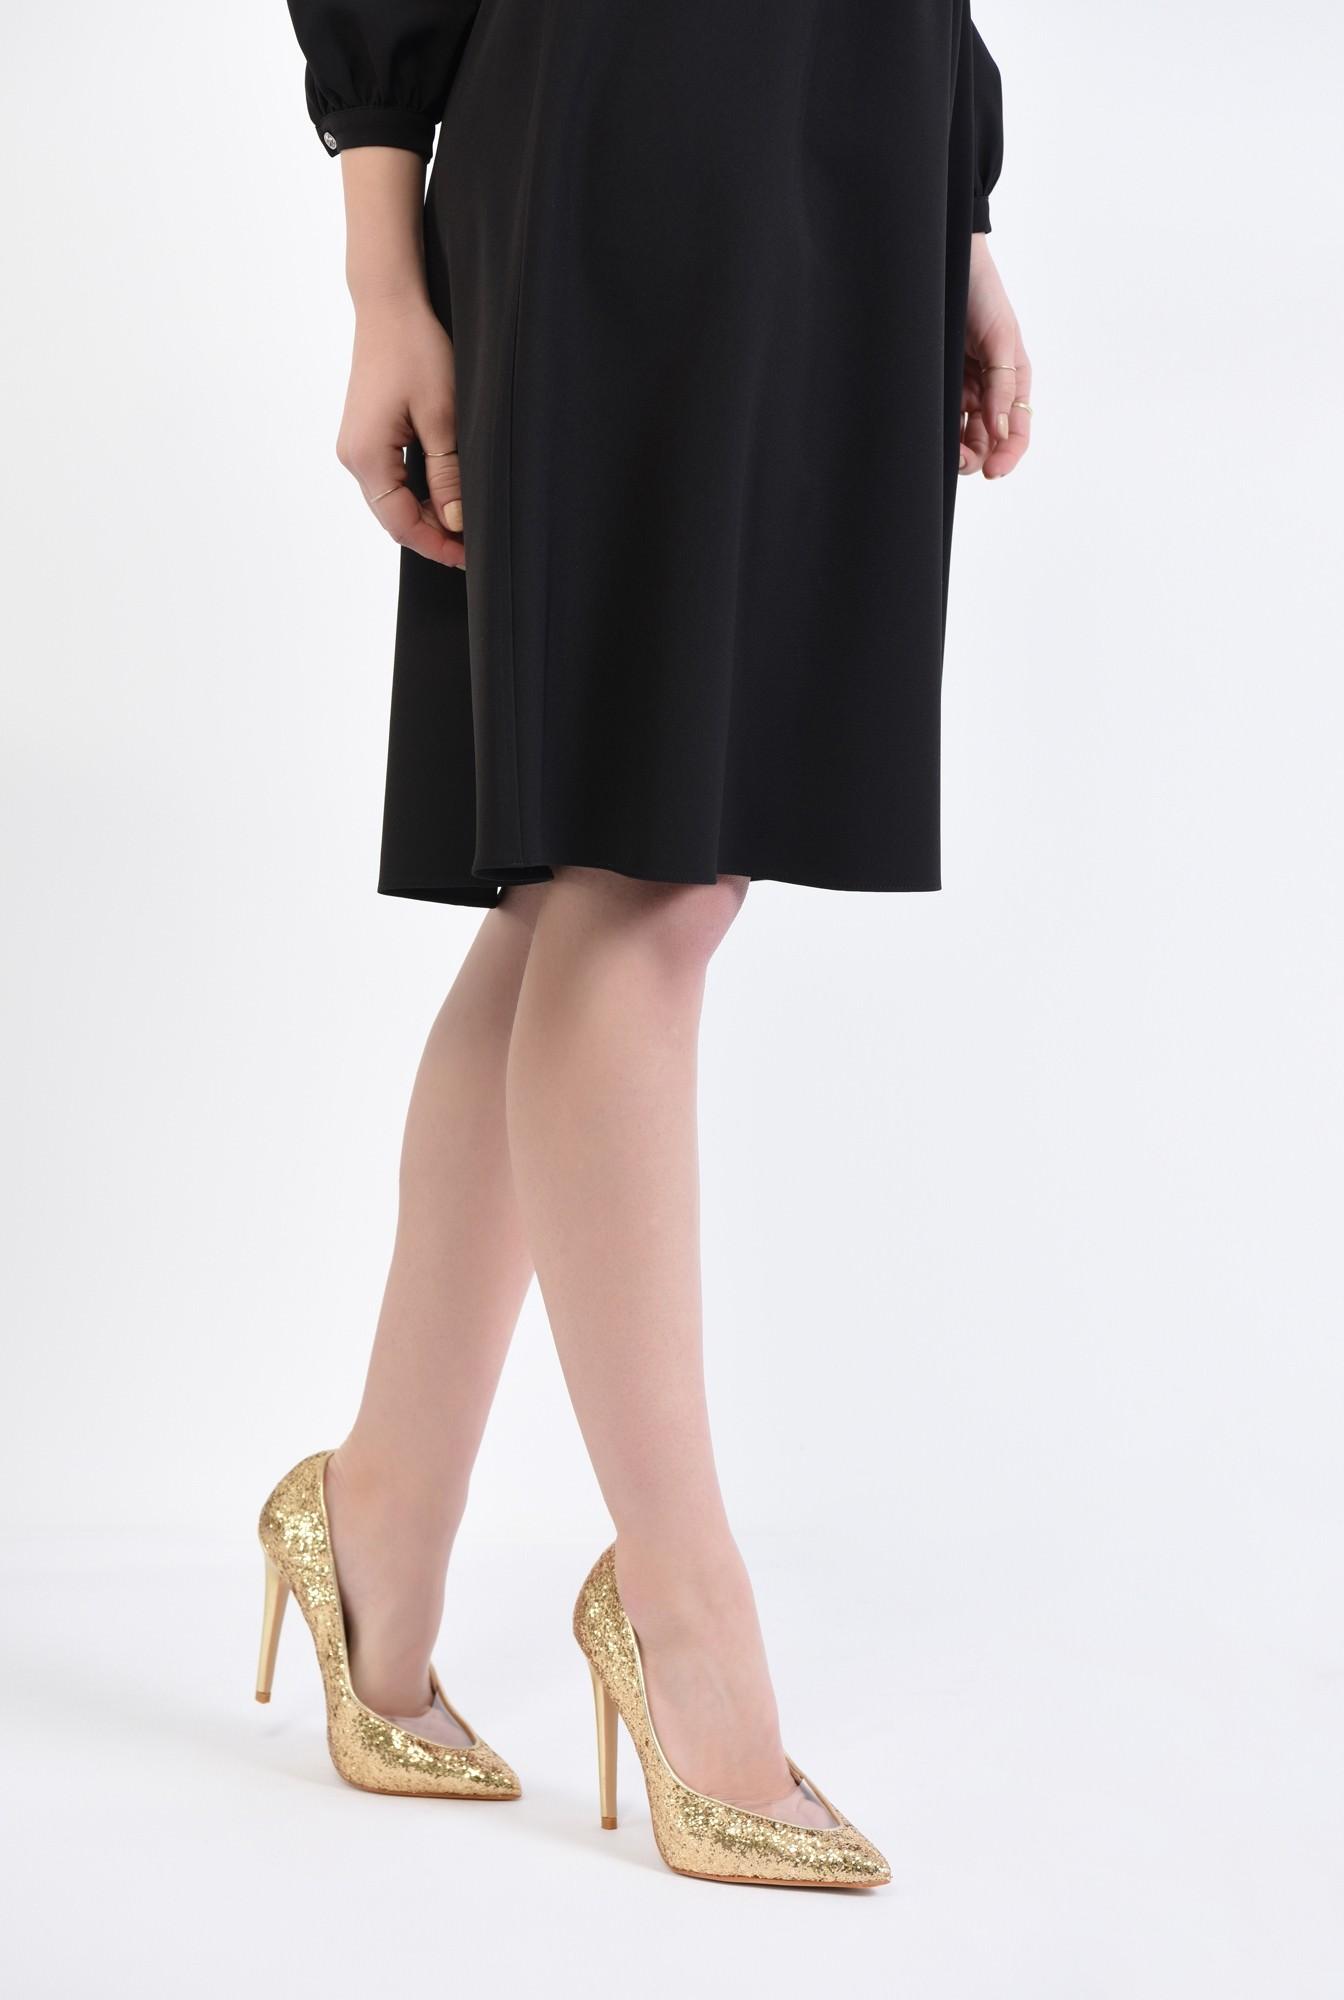 4 - pantofi eleganti, auriu, stiletto, glitter